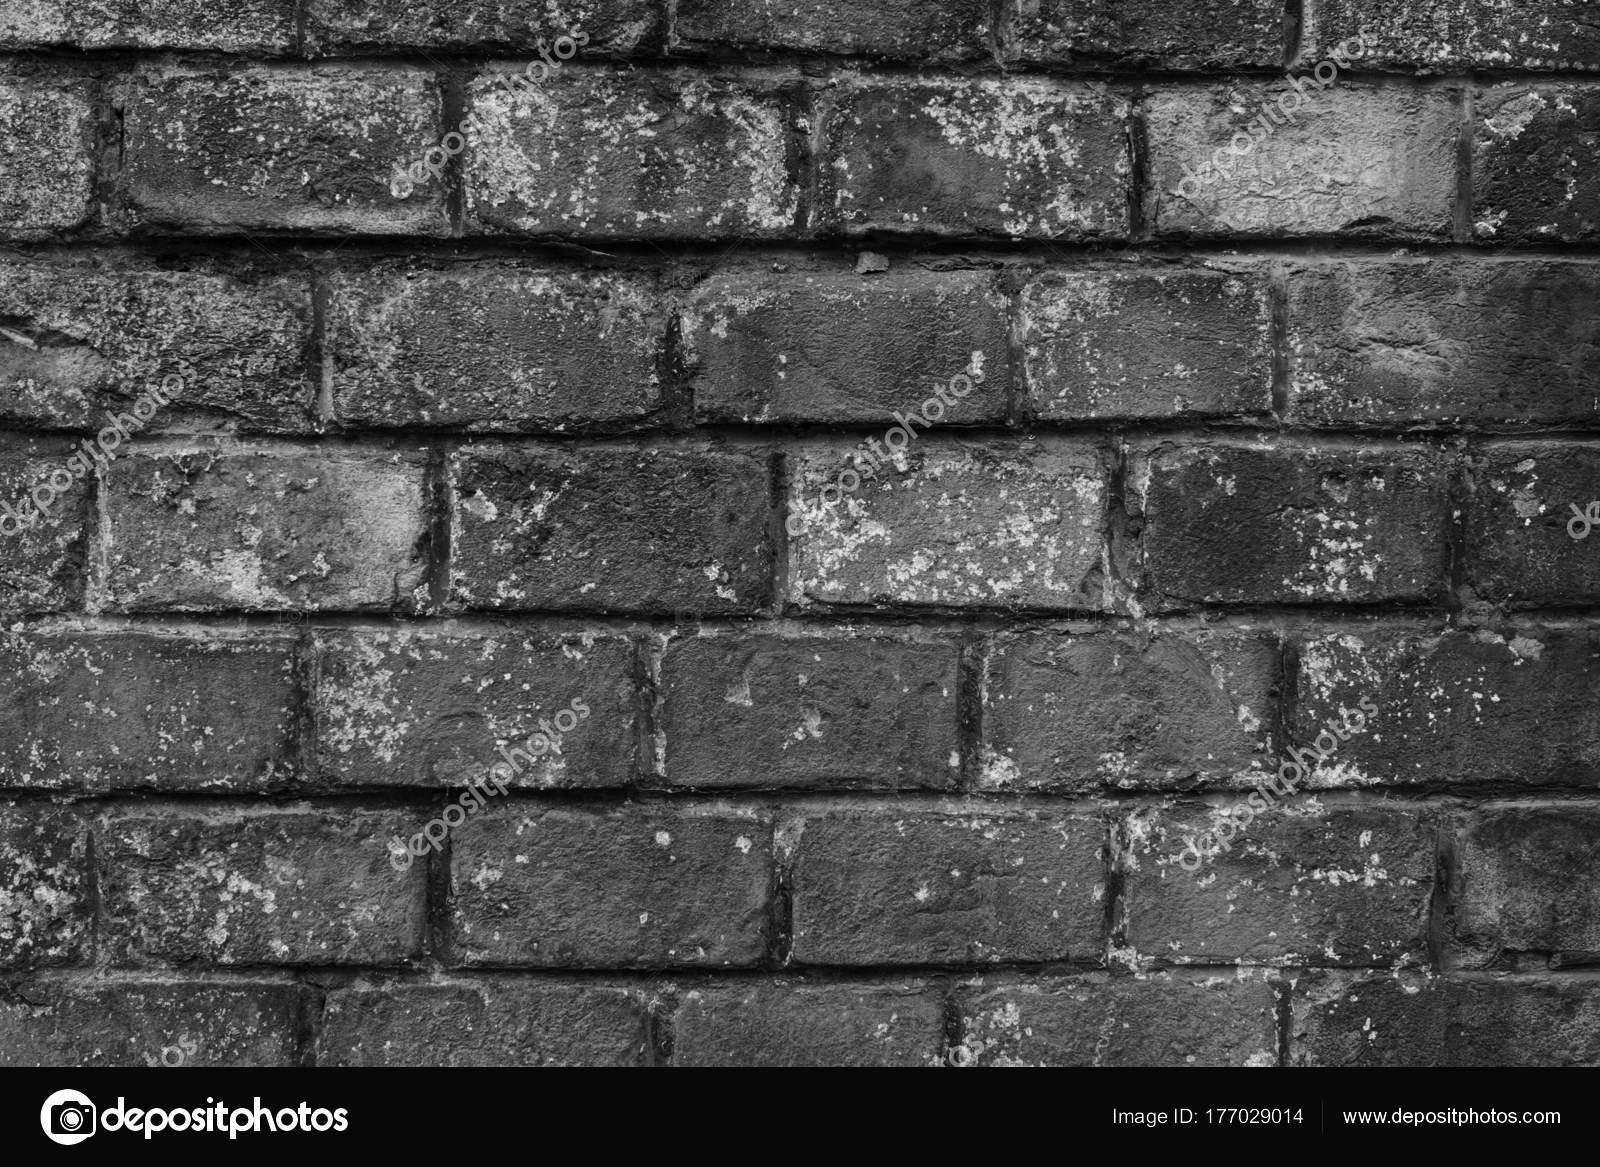 Background Grey Brick Wall Very Old Grey Brick Wall